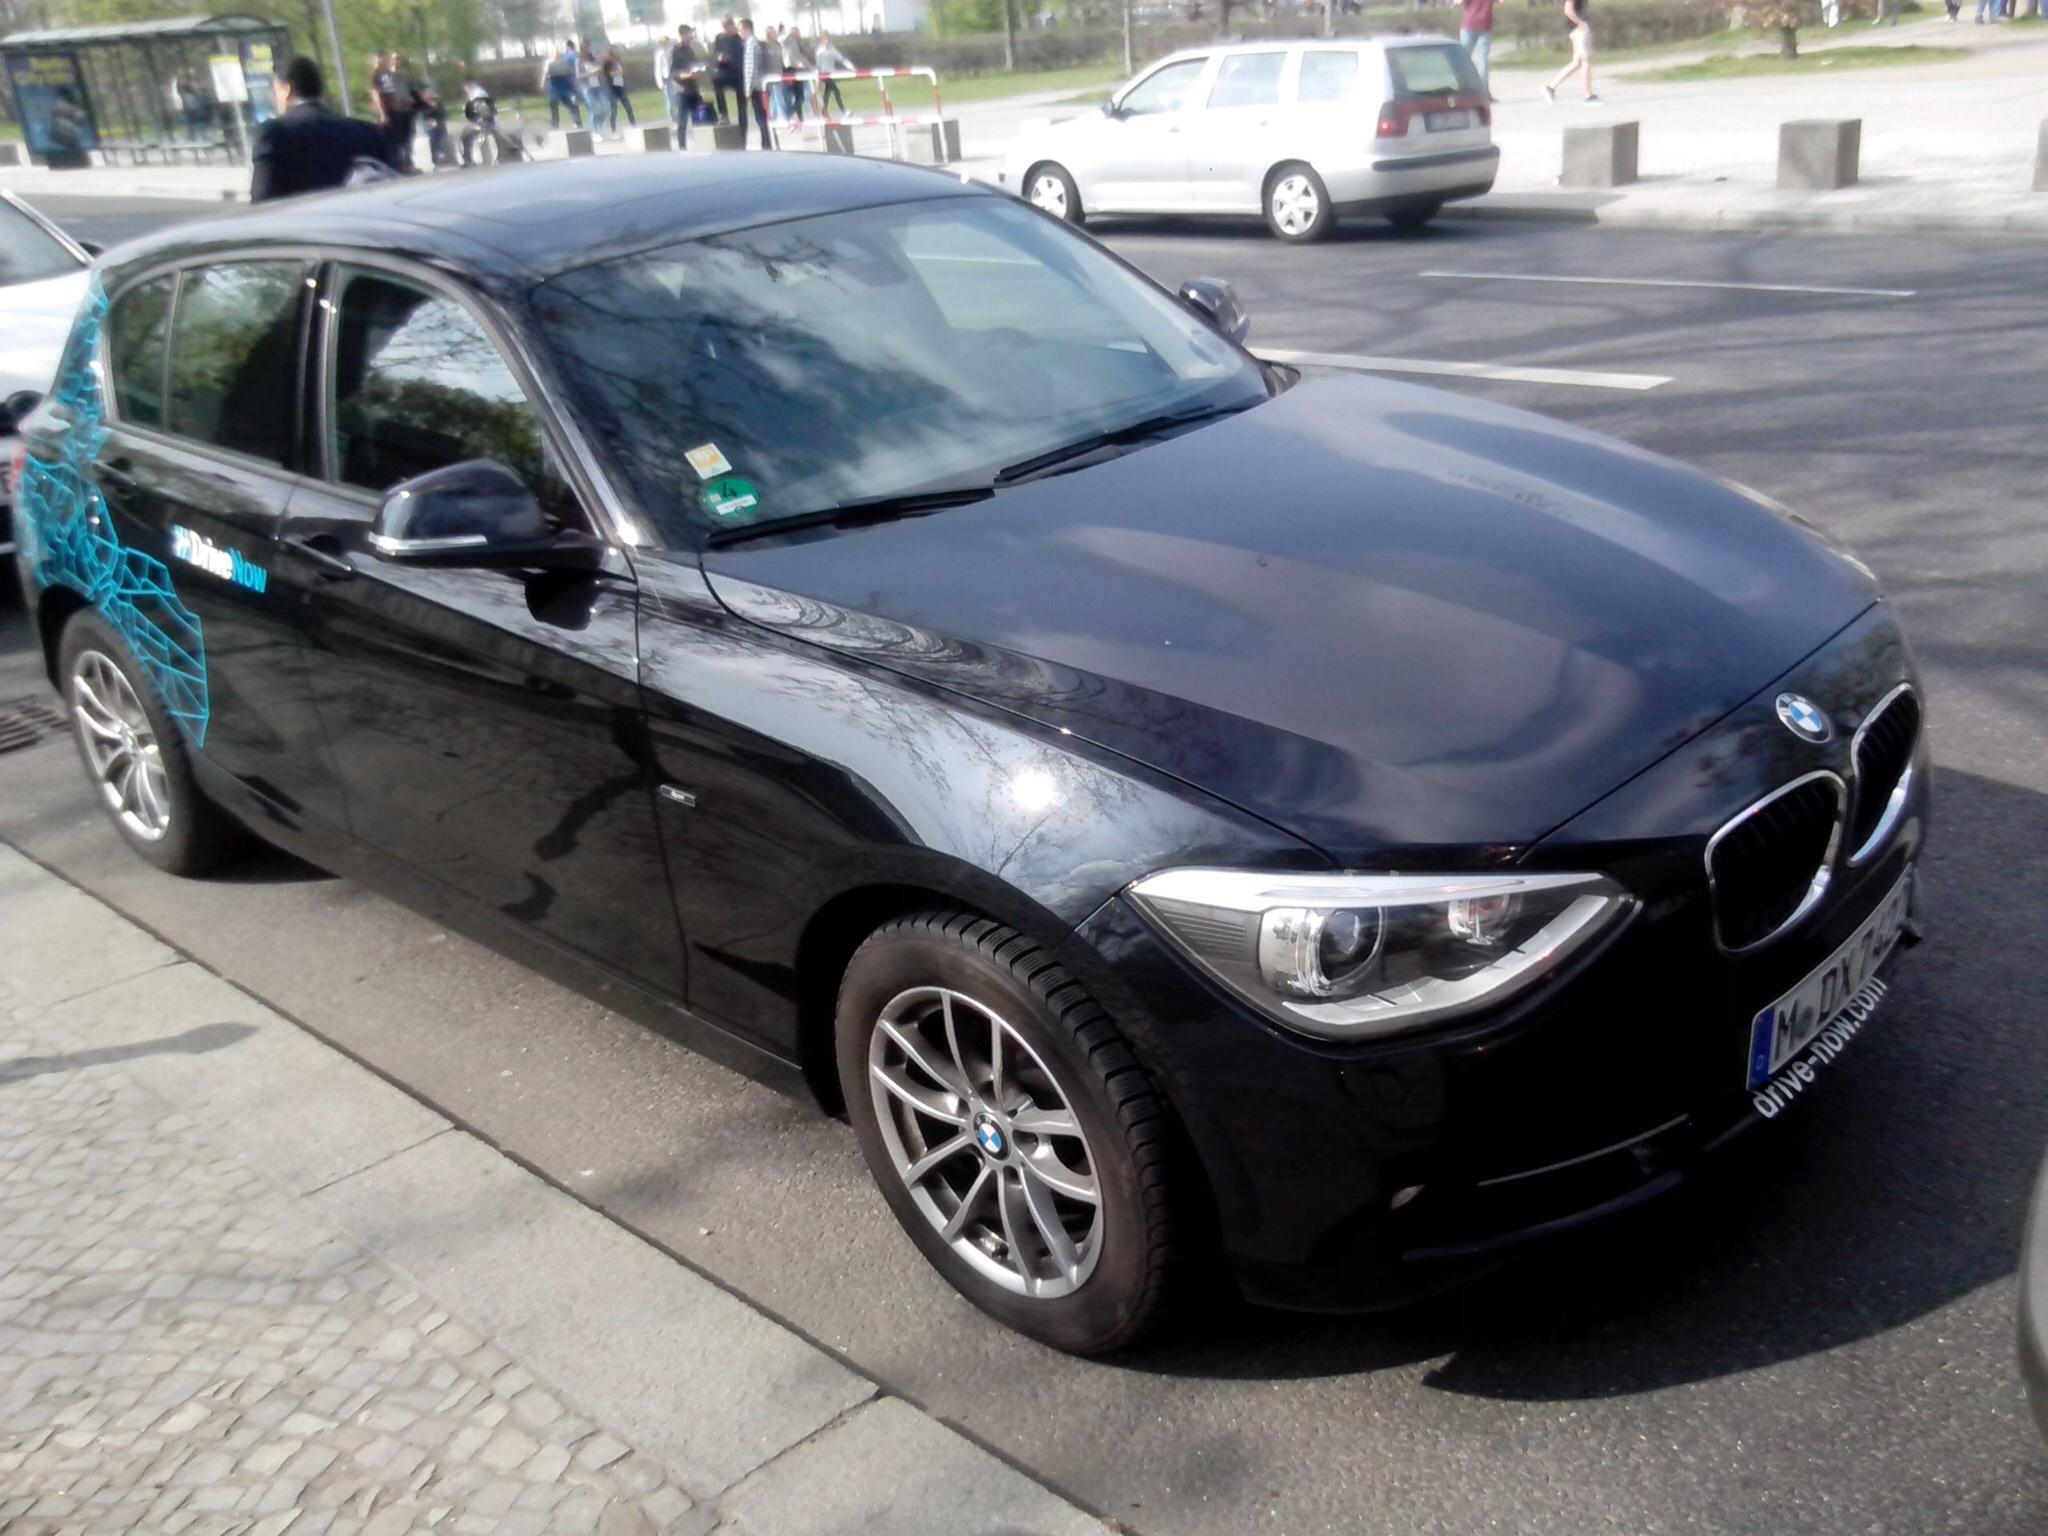 1506_CarSharing_Berlin bmw (1)